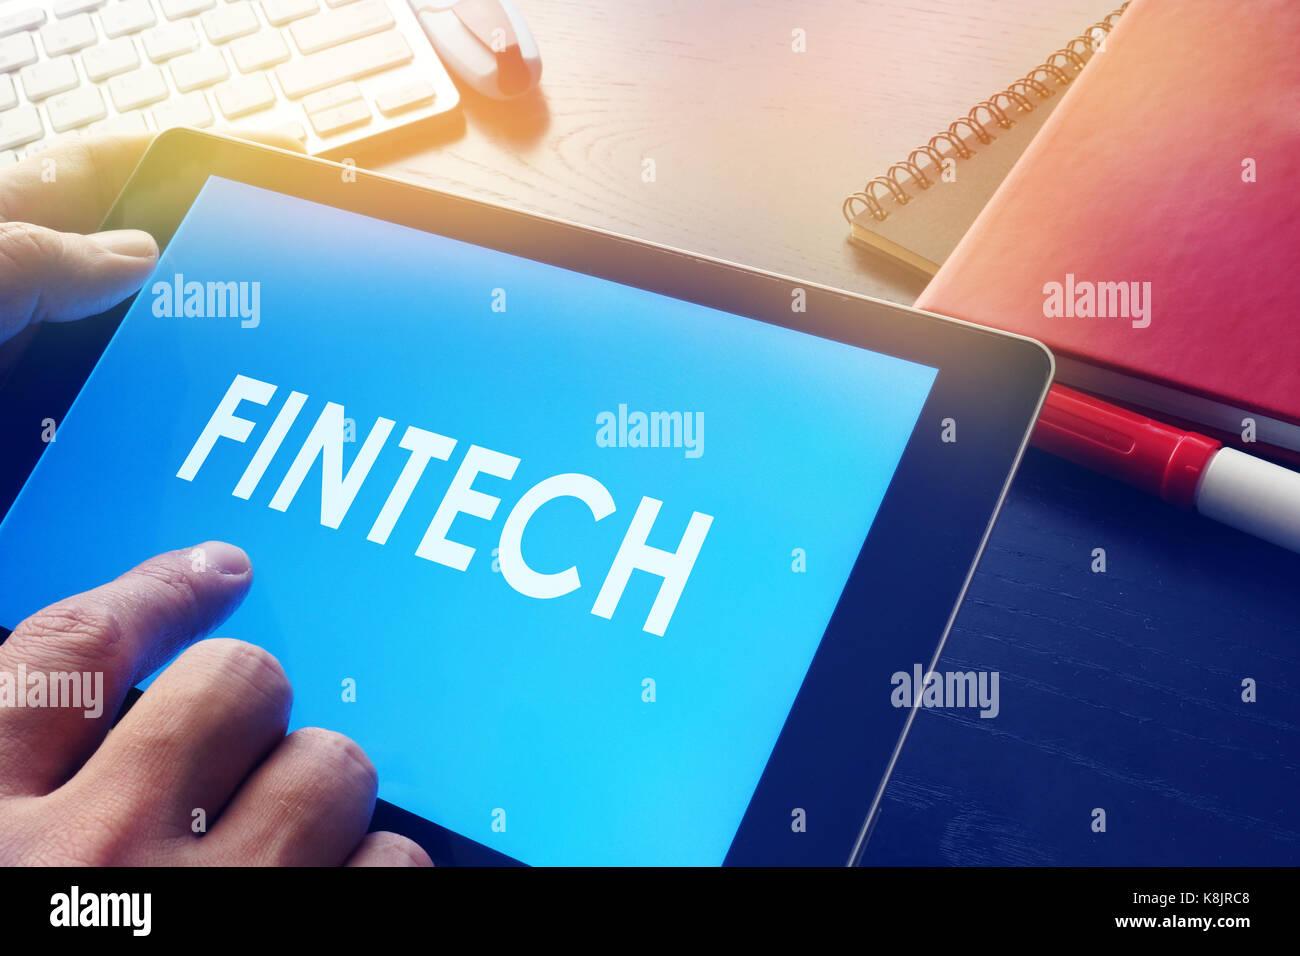 Businessman  reading about fintech. Financial technology concept. - Stock Image